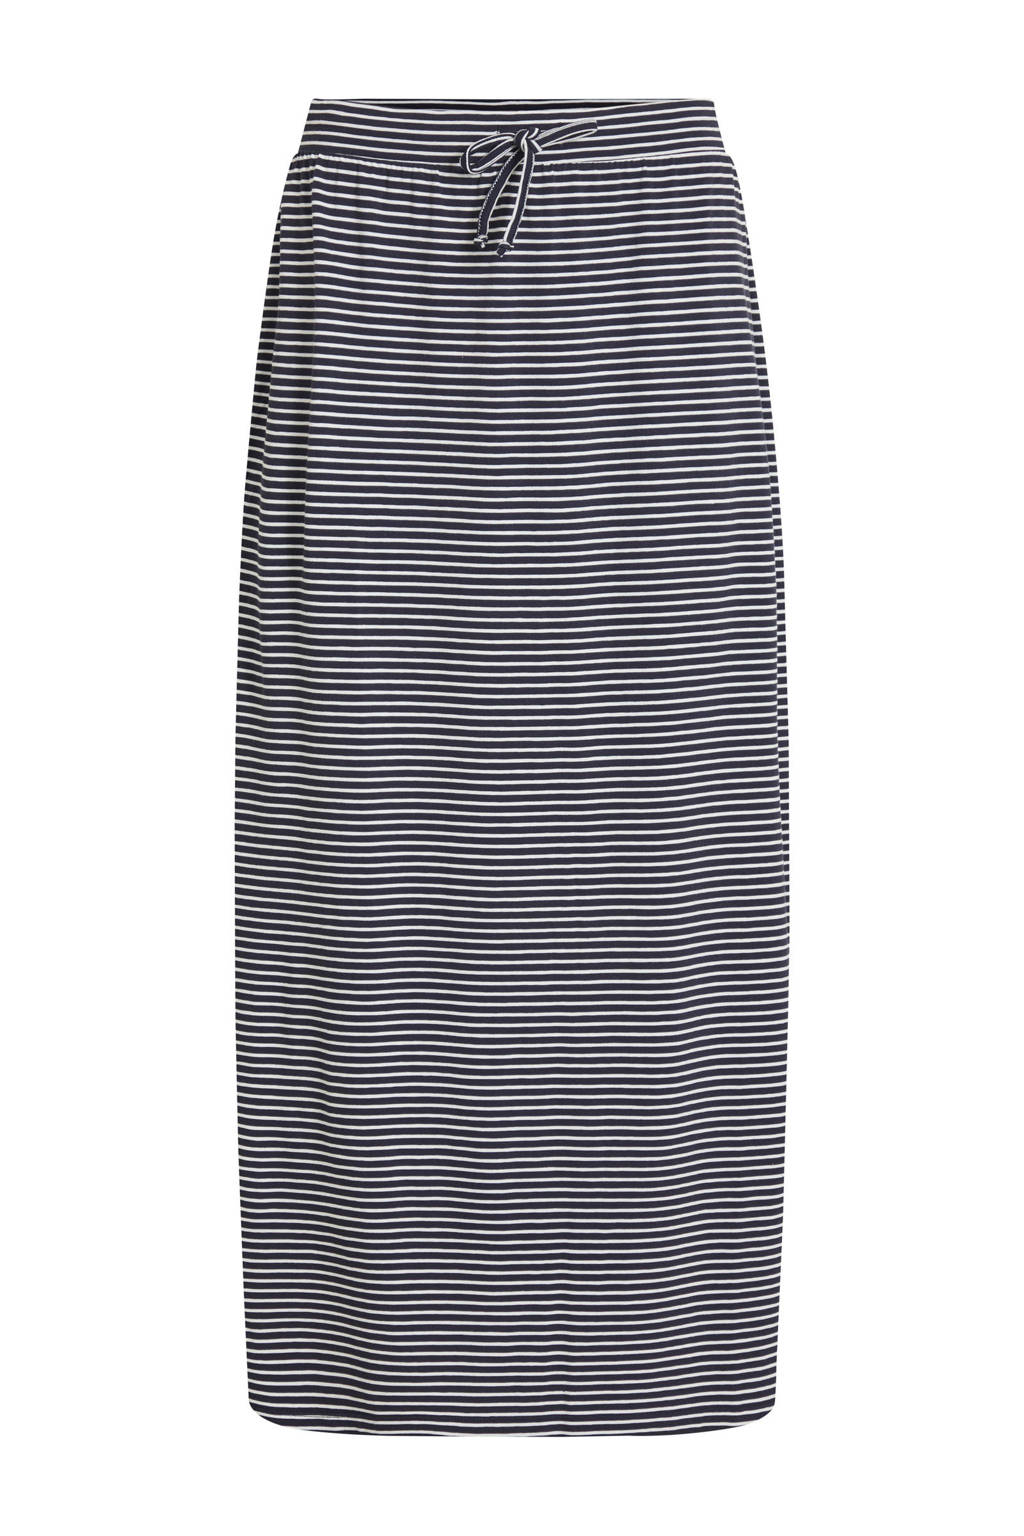 Fonkelnieuw OBJECT gestreepte rok blauw/wit | wehkamp UO-53